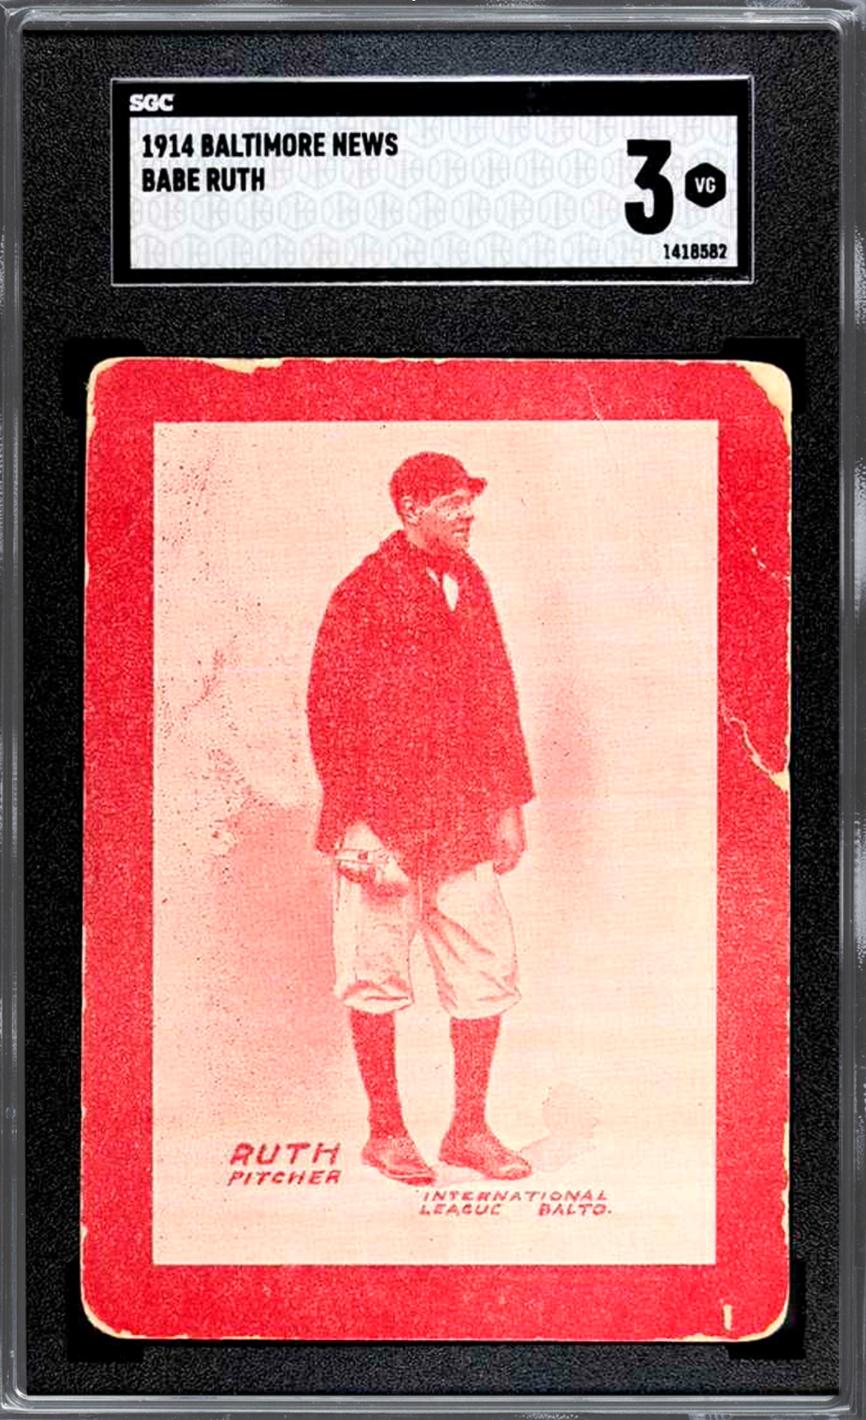 1914 Baltimore News Babe Ruth (SGC 3)